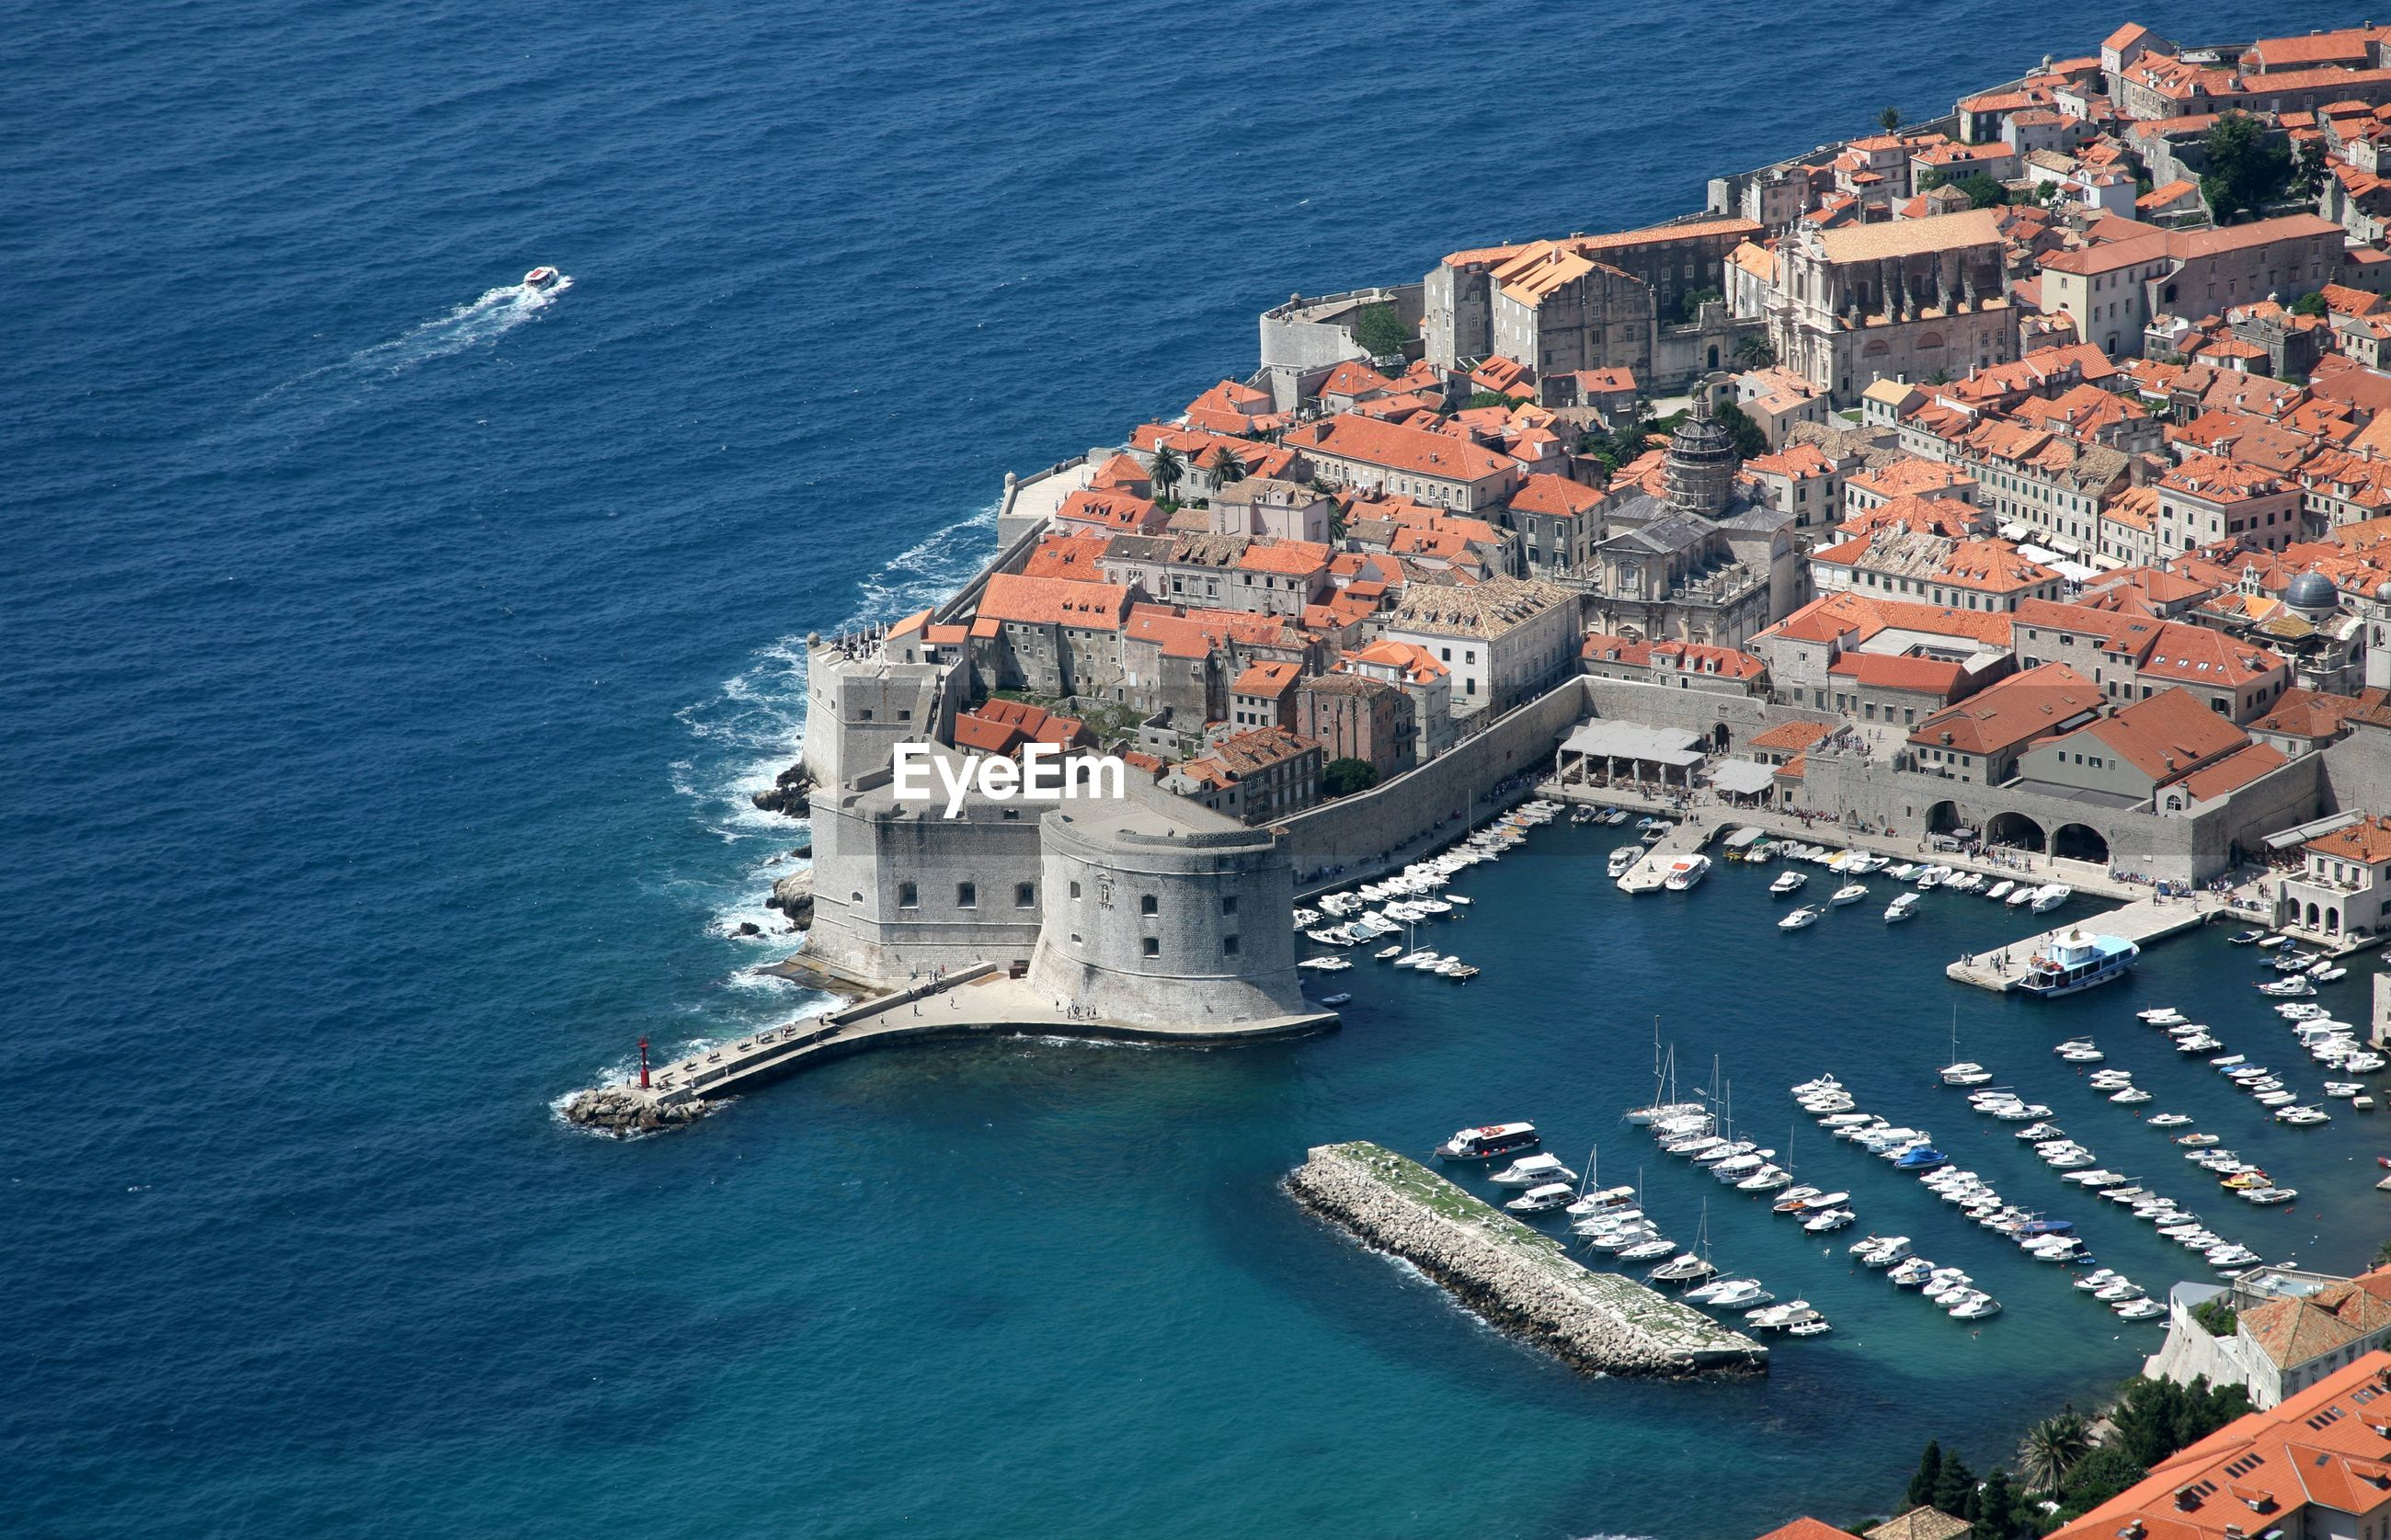 Walls of dubrovnik by adriatic sea